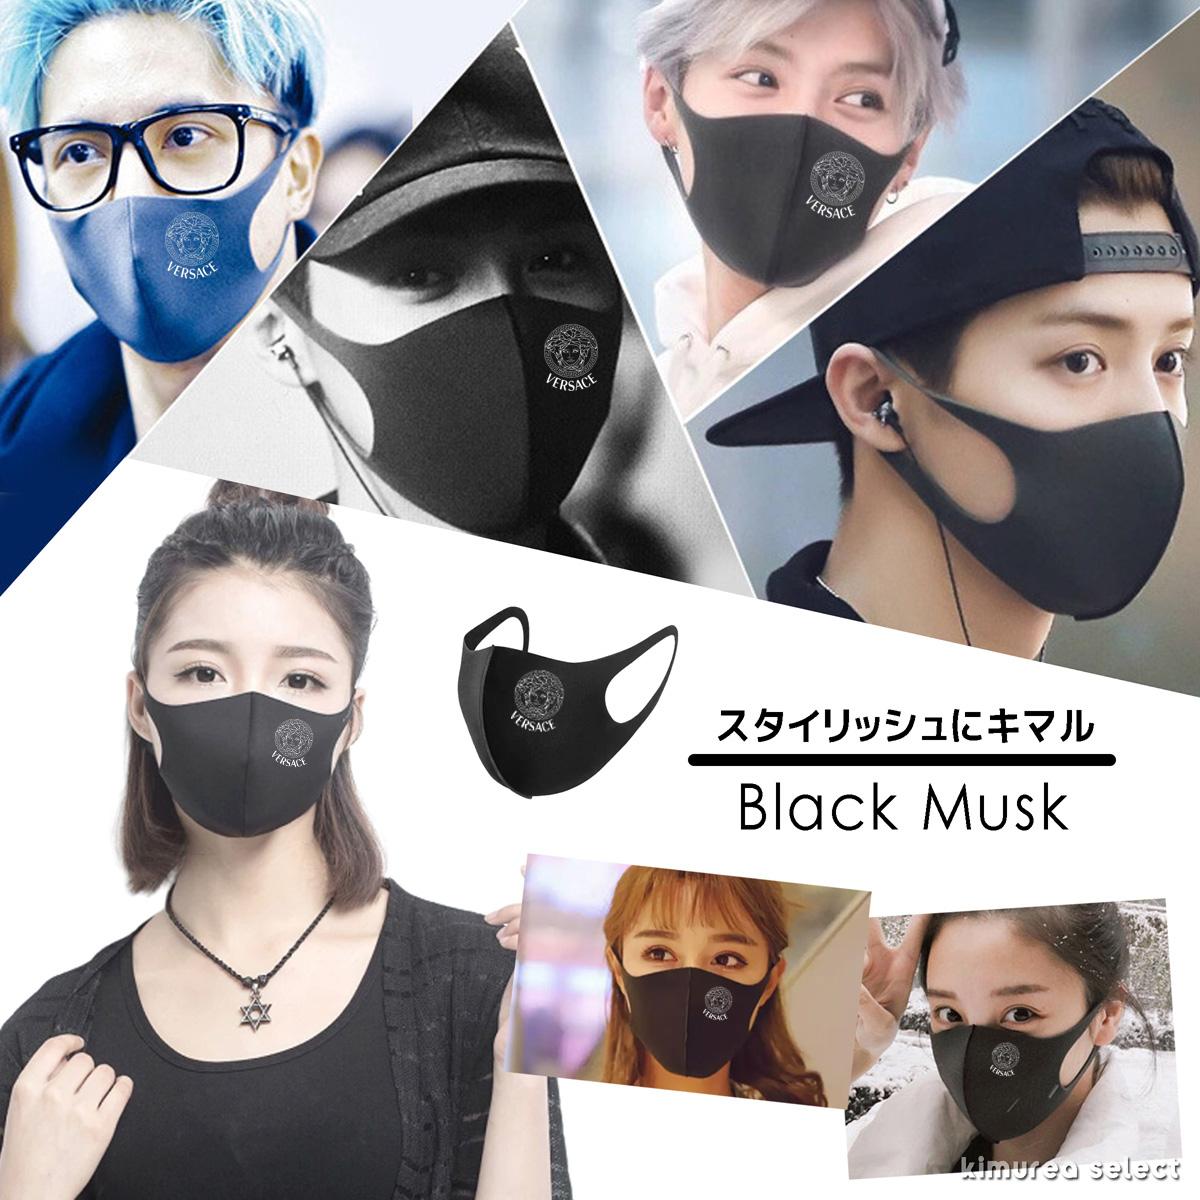 quality masks